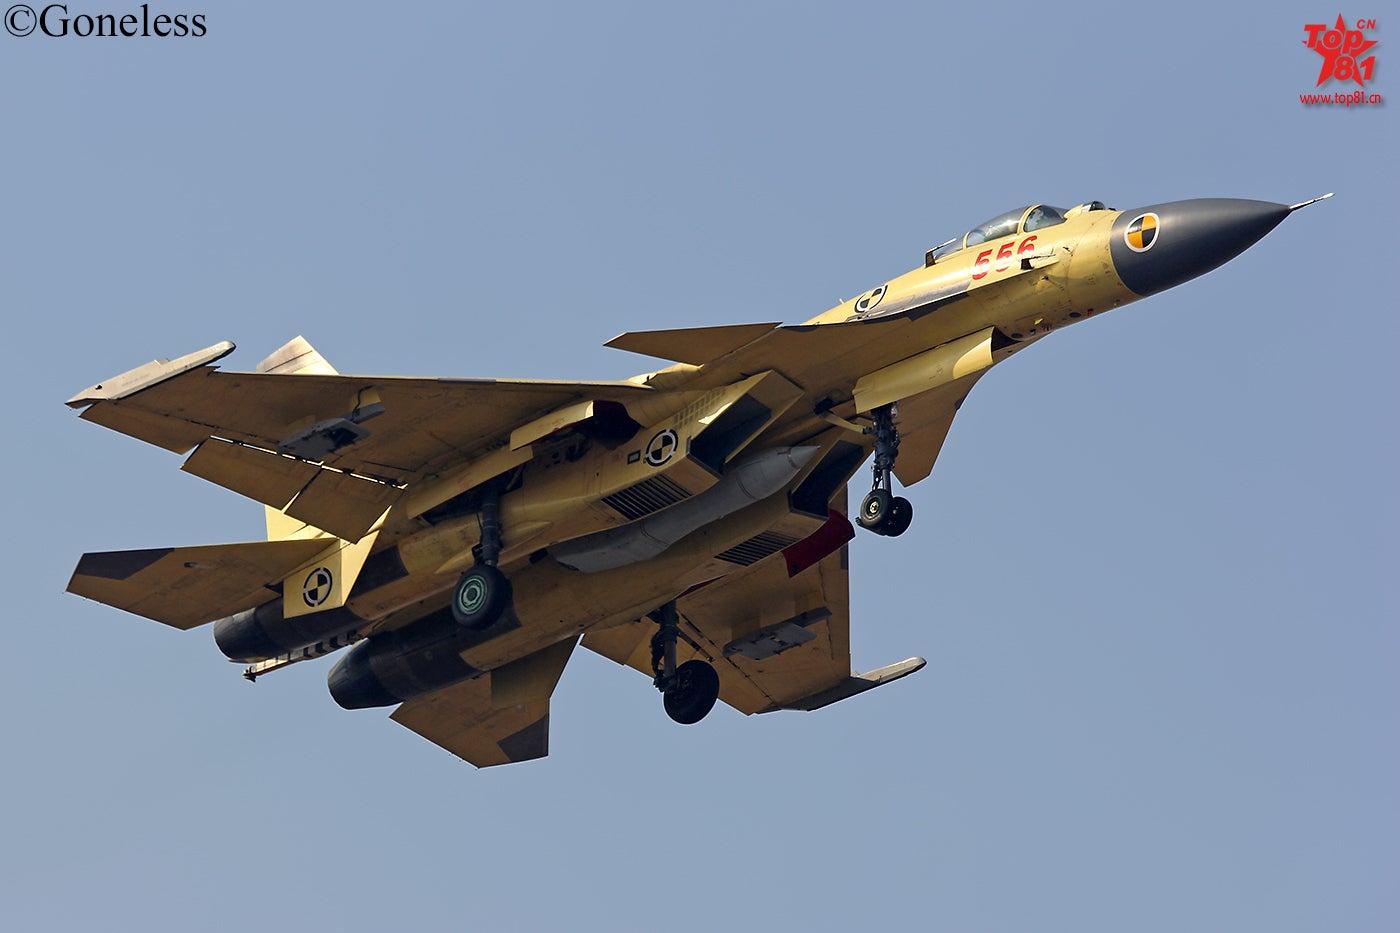 Tanker Buddies: Chinese Navy J-15 Fighter Planes Refuel in Flight